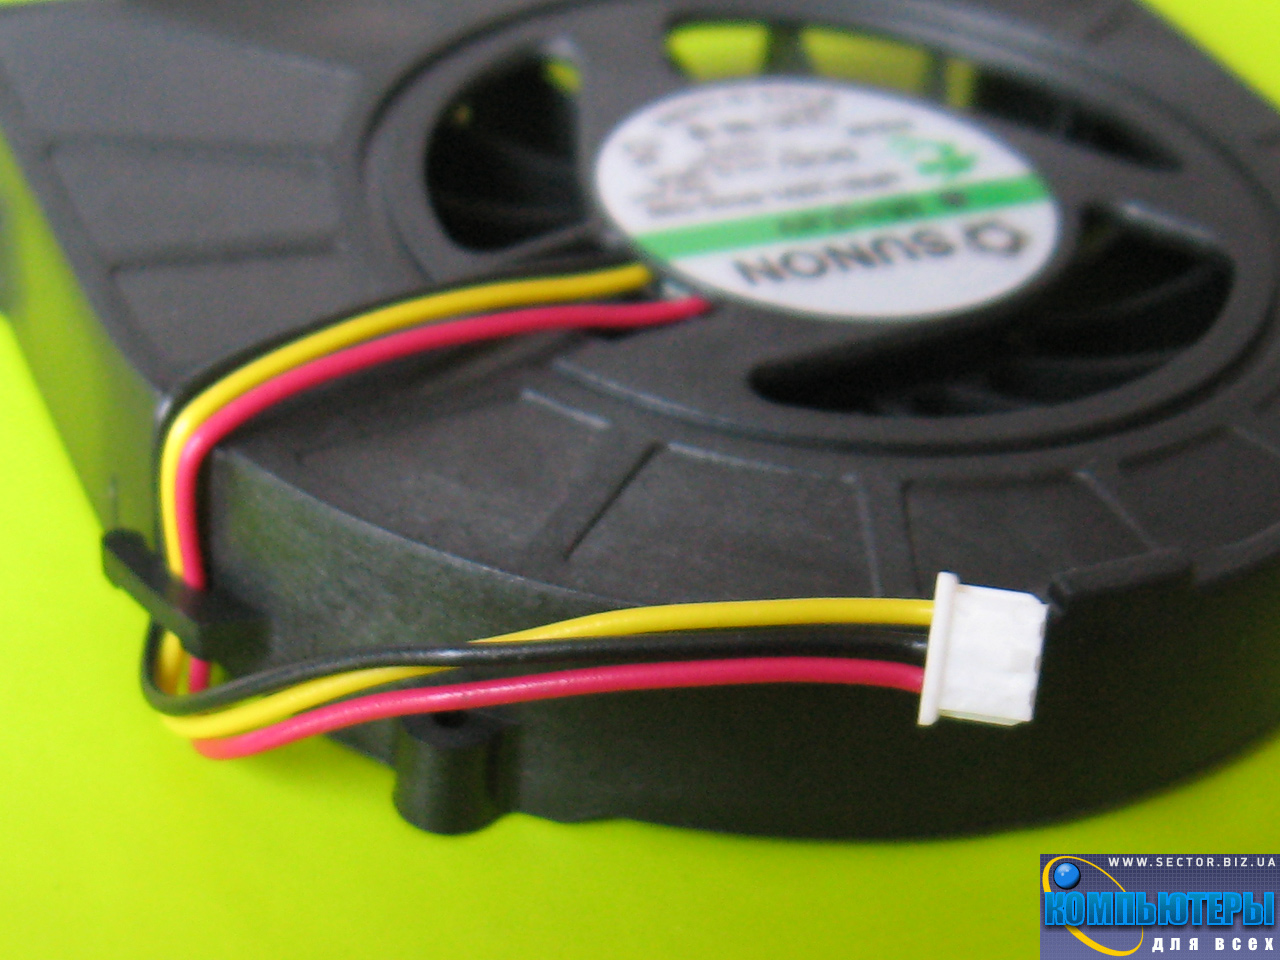 Кулер к ноутбуку Dell Inspiron 15R N5010 M5010 p/n: MF60120V1-B020-G99. Фото № 4.